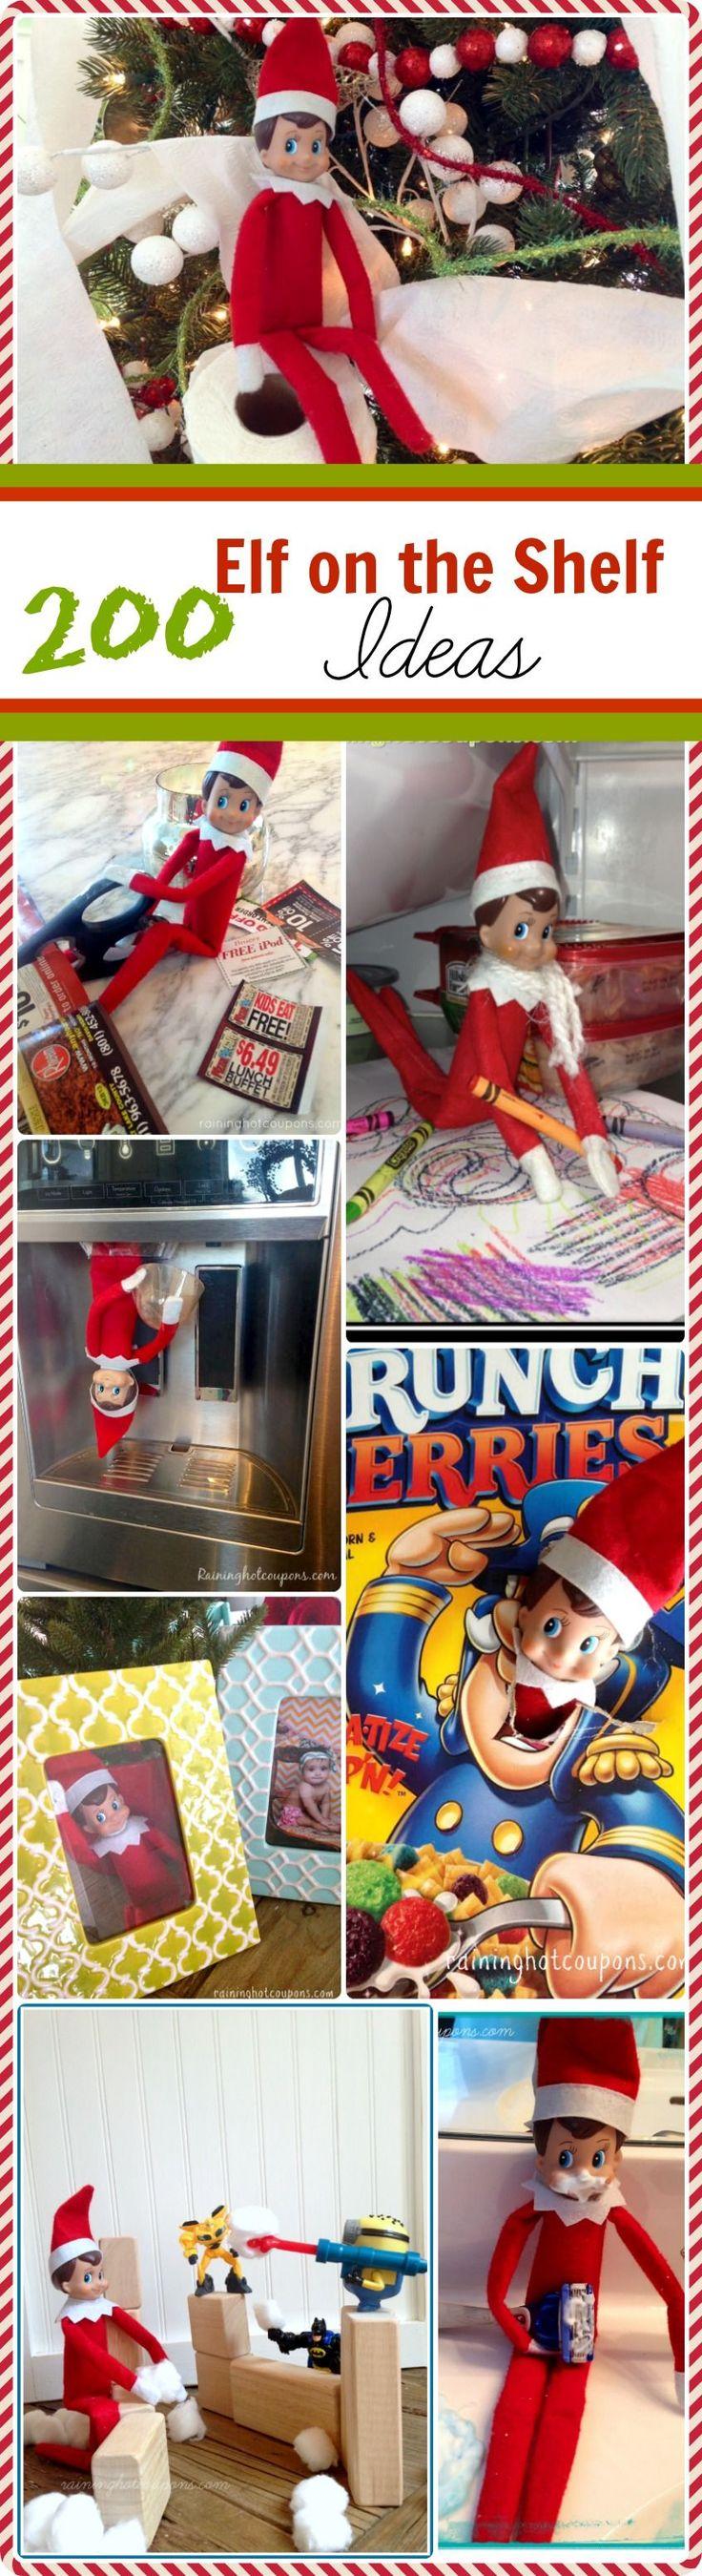 200 Easy Elf on the Shelf Ideas